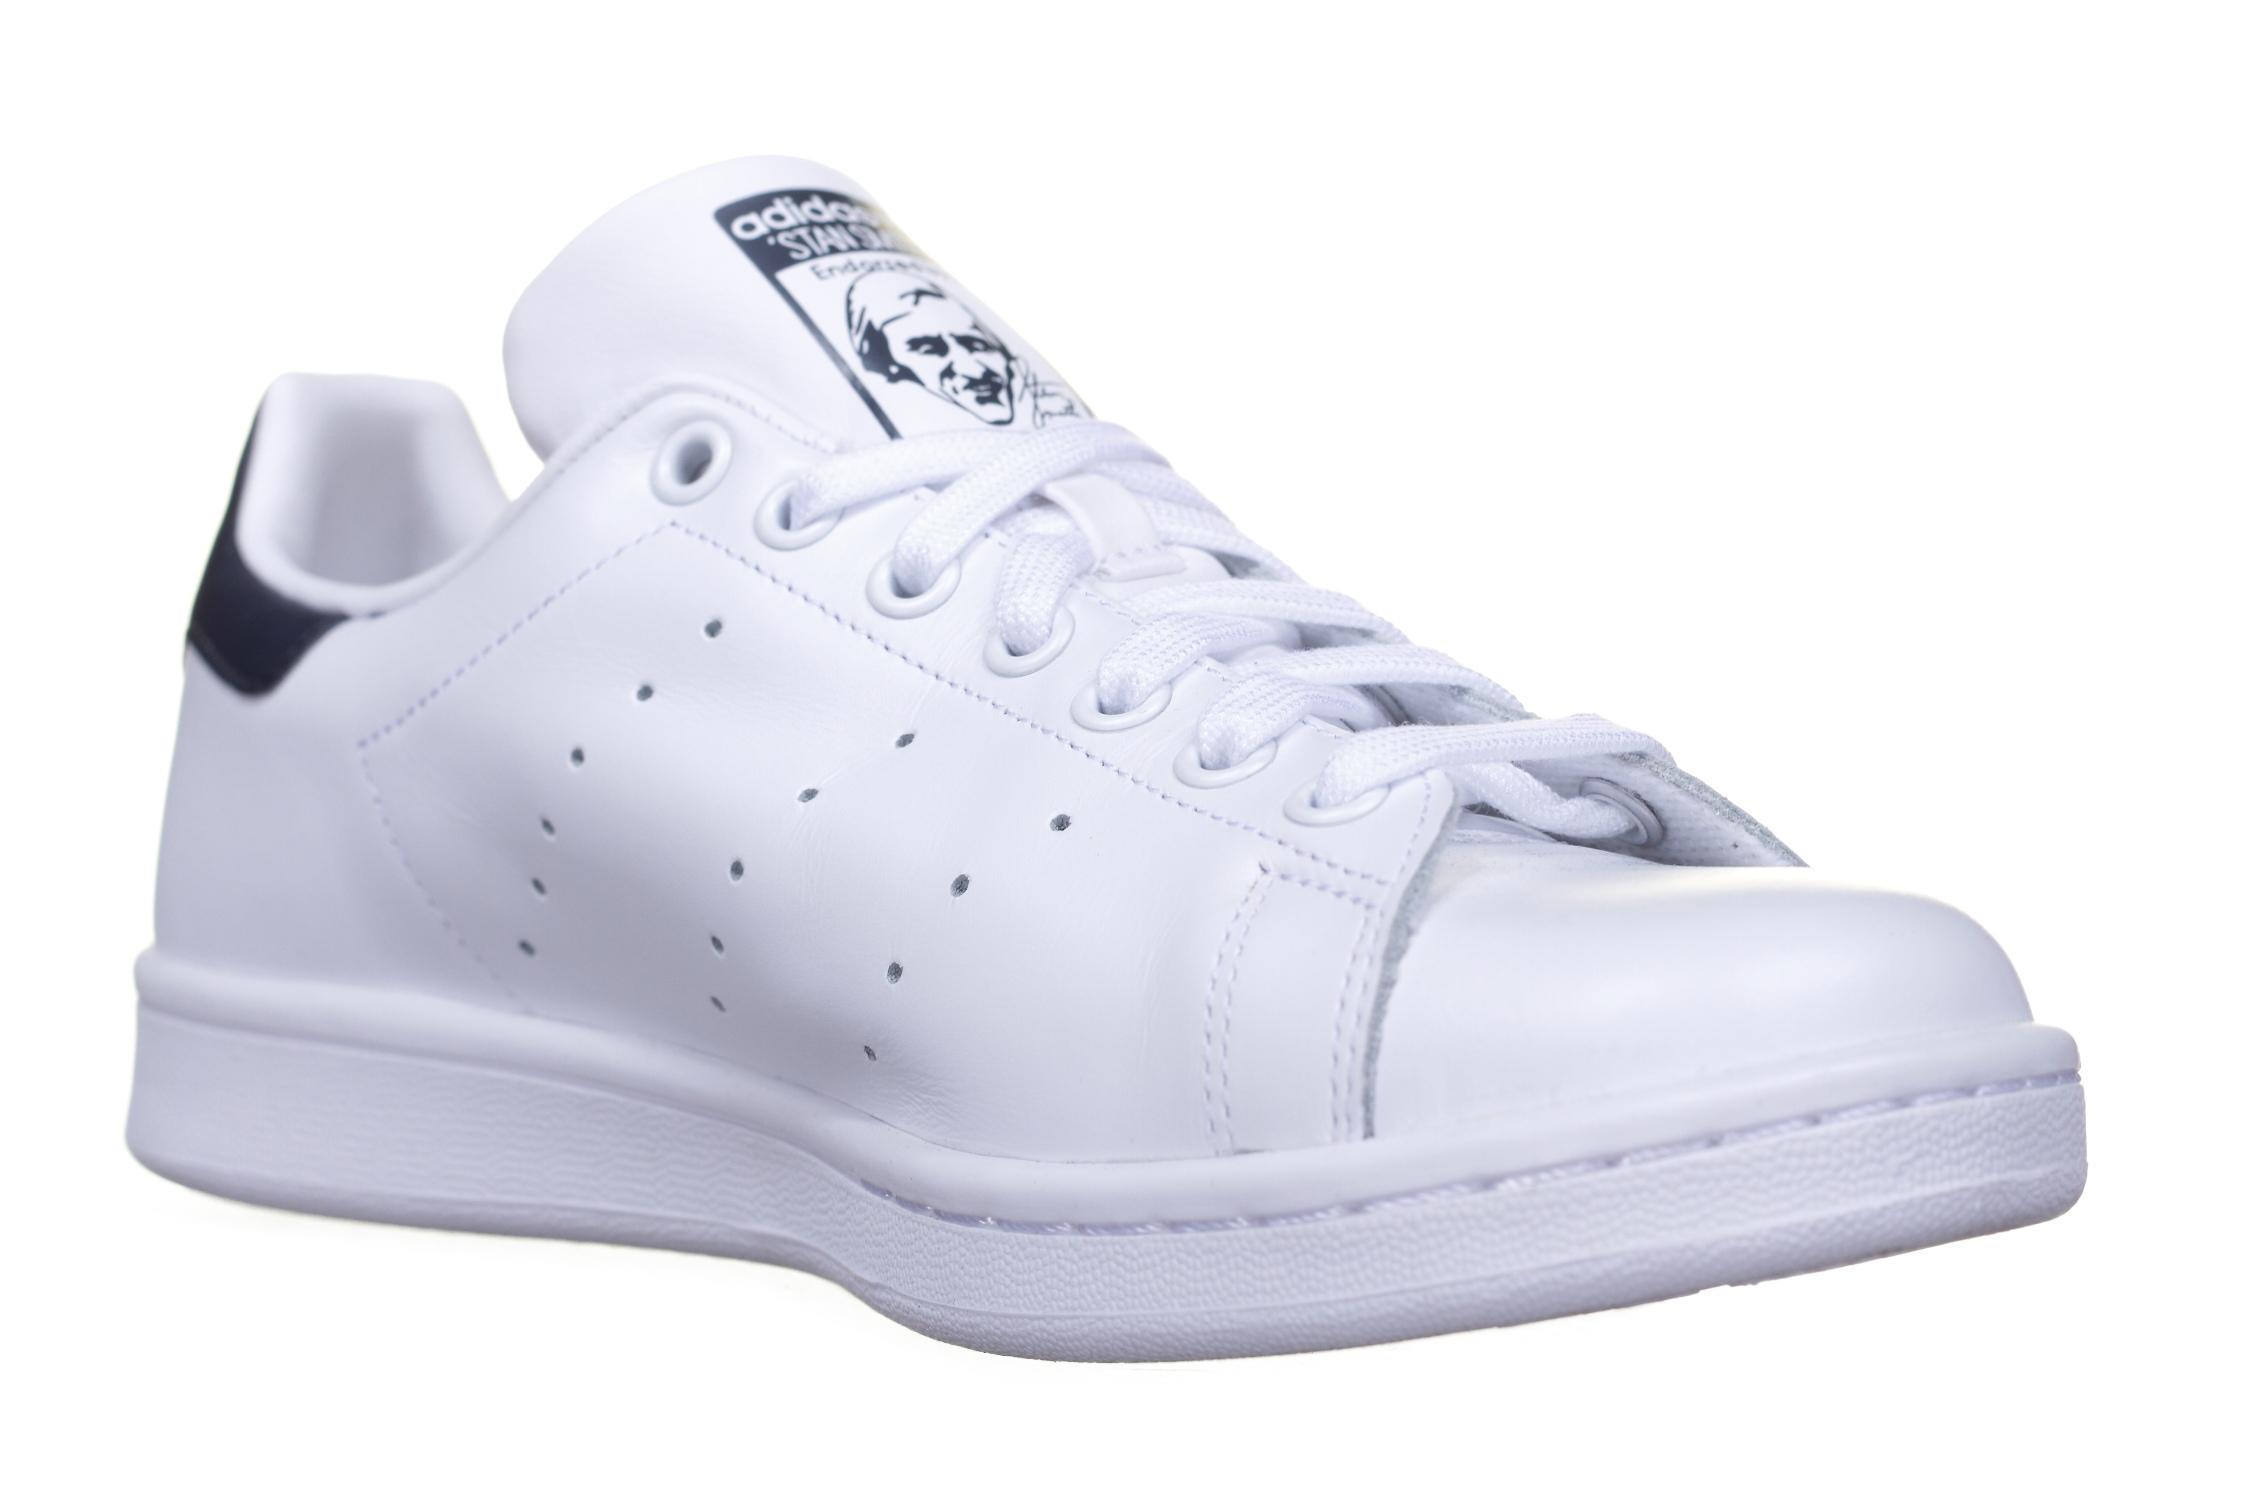 https://www.leadermode.com/78558/adidas-stan-smith-m20325-blanc-marine.jpg